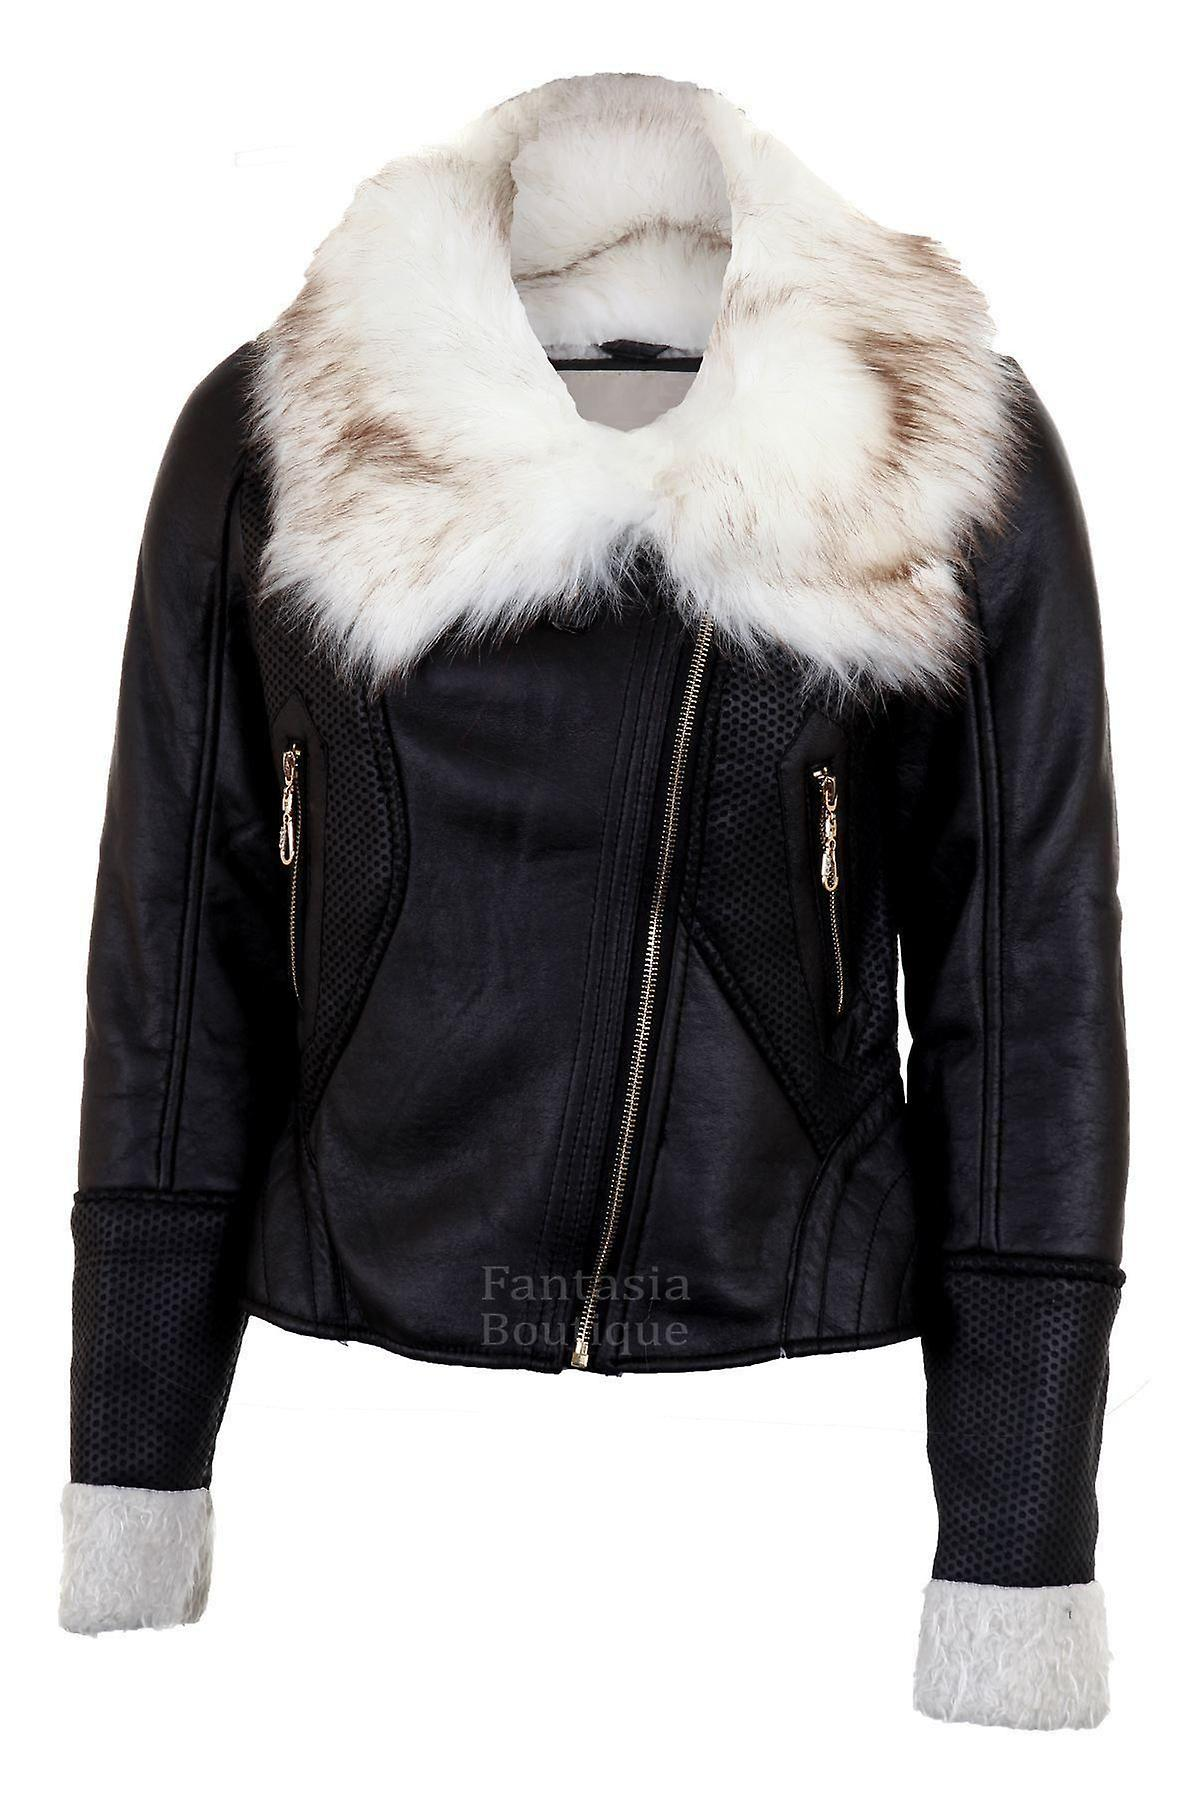 Ladies Long Sleeve Fur Neck Wool Lined Zip Leather PVC Women's Jacket Coat